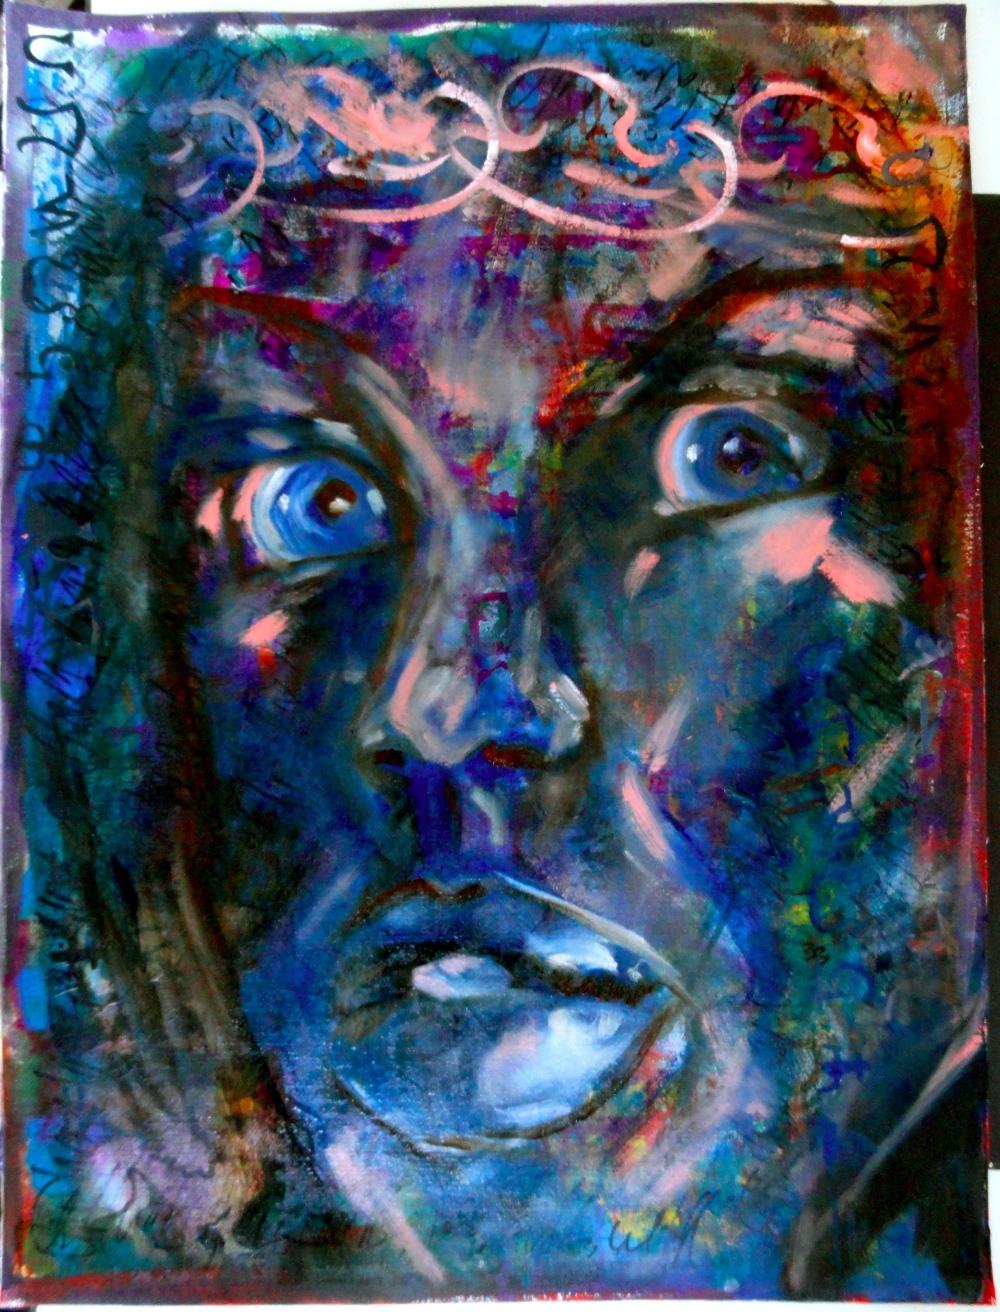 Cynisca. Cheryl Penn. The Bhubezi Mythology. The Women Who Hold Up the World